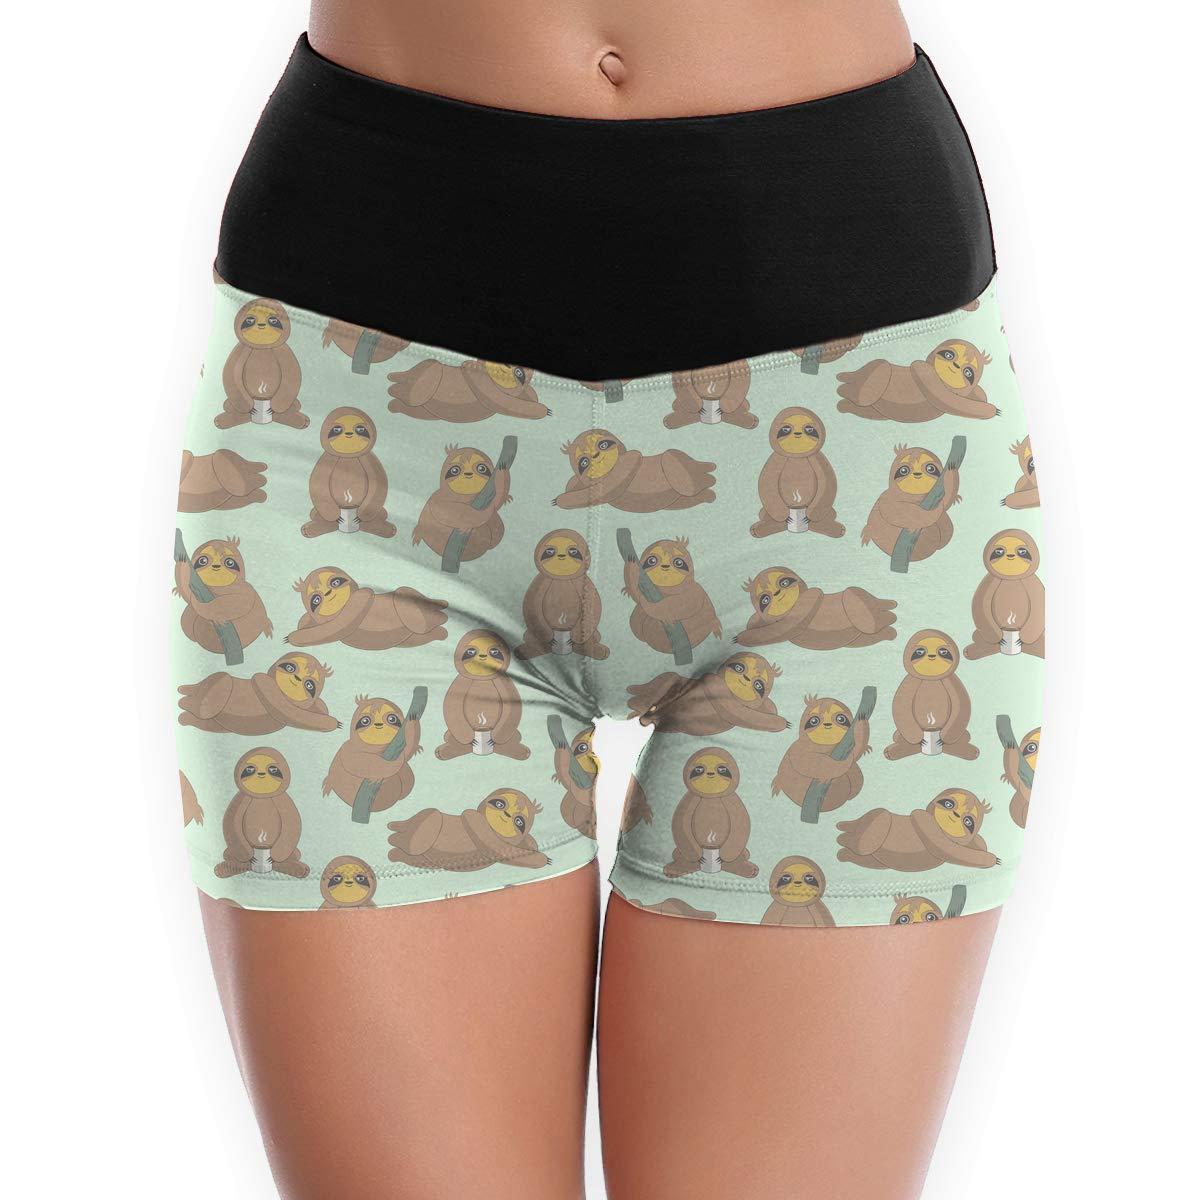 LDGT@DU Womens Yoga Shorts Cute Funny Sloth Pattern Athletic Sports Shorts